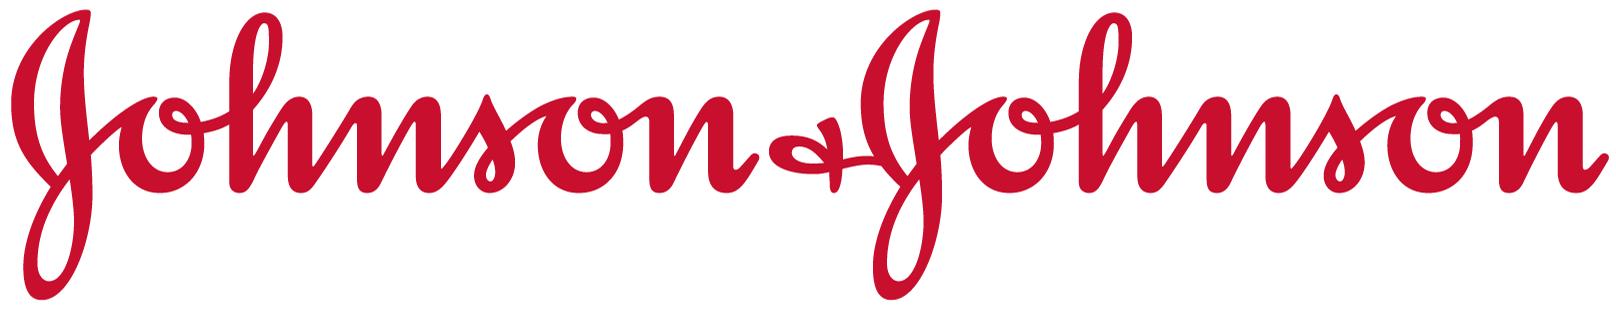 jnj-logo-signature-rgb-red.png